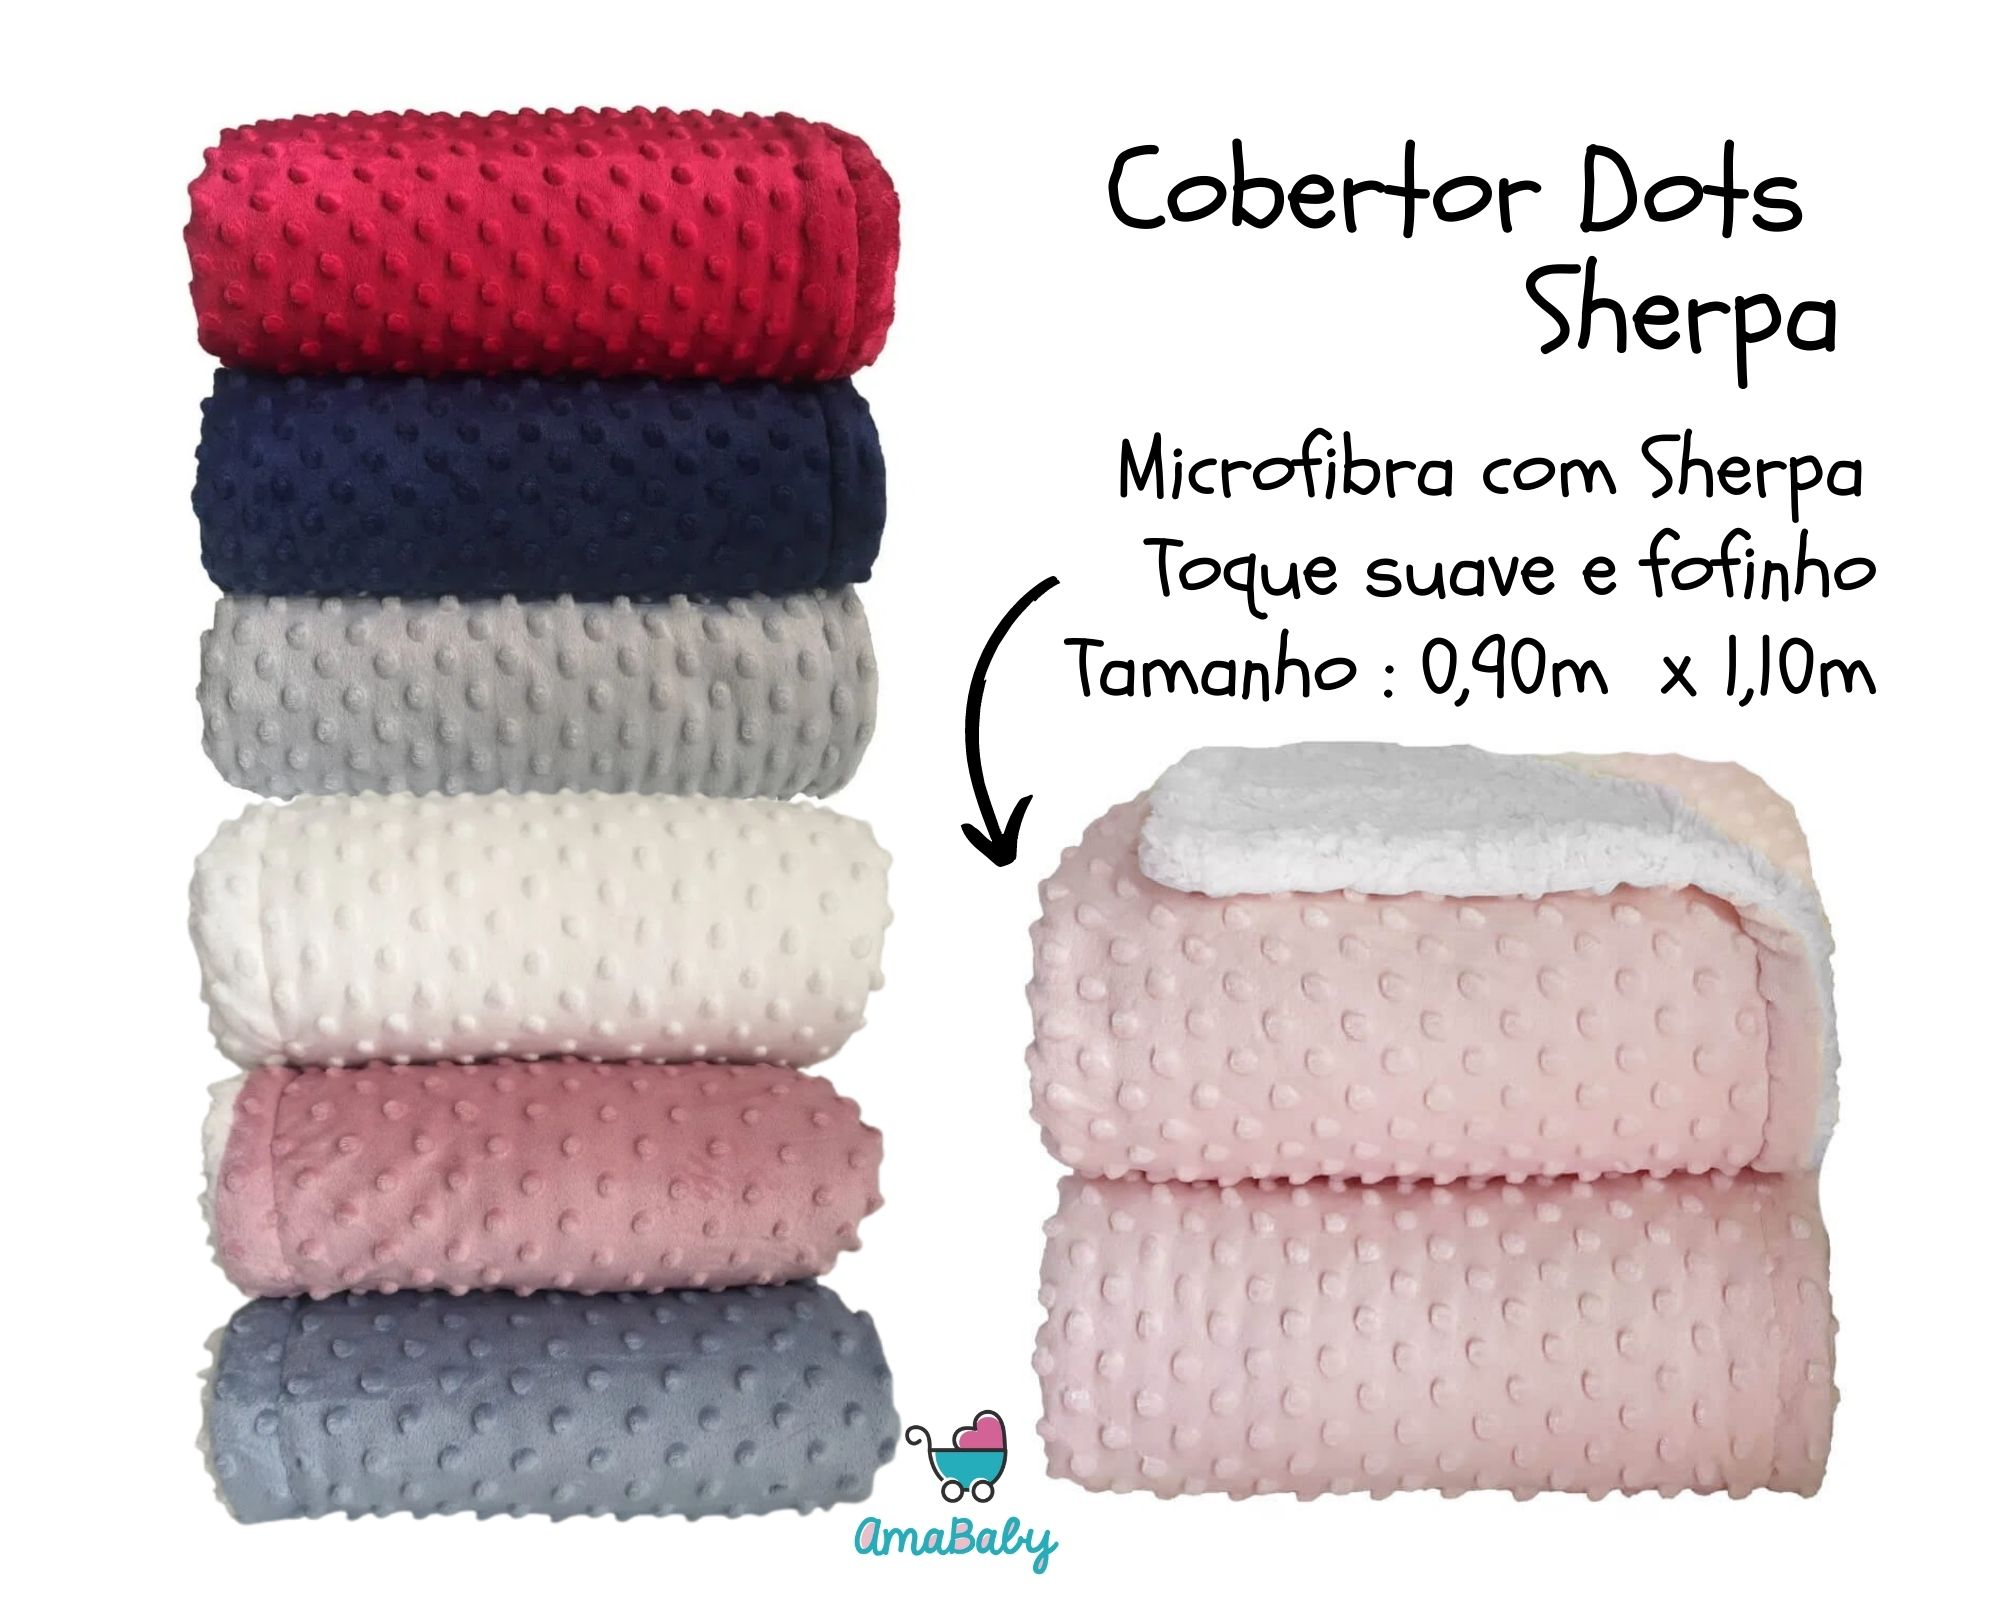 Cobertor Dots Plush Sherpam Cor:Vermelho